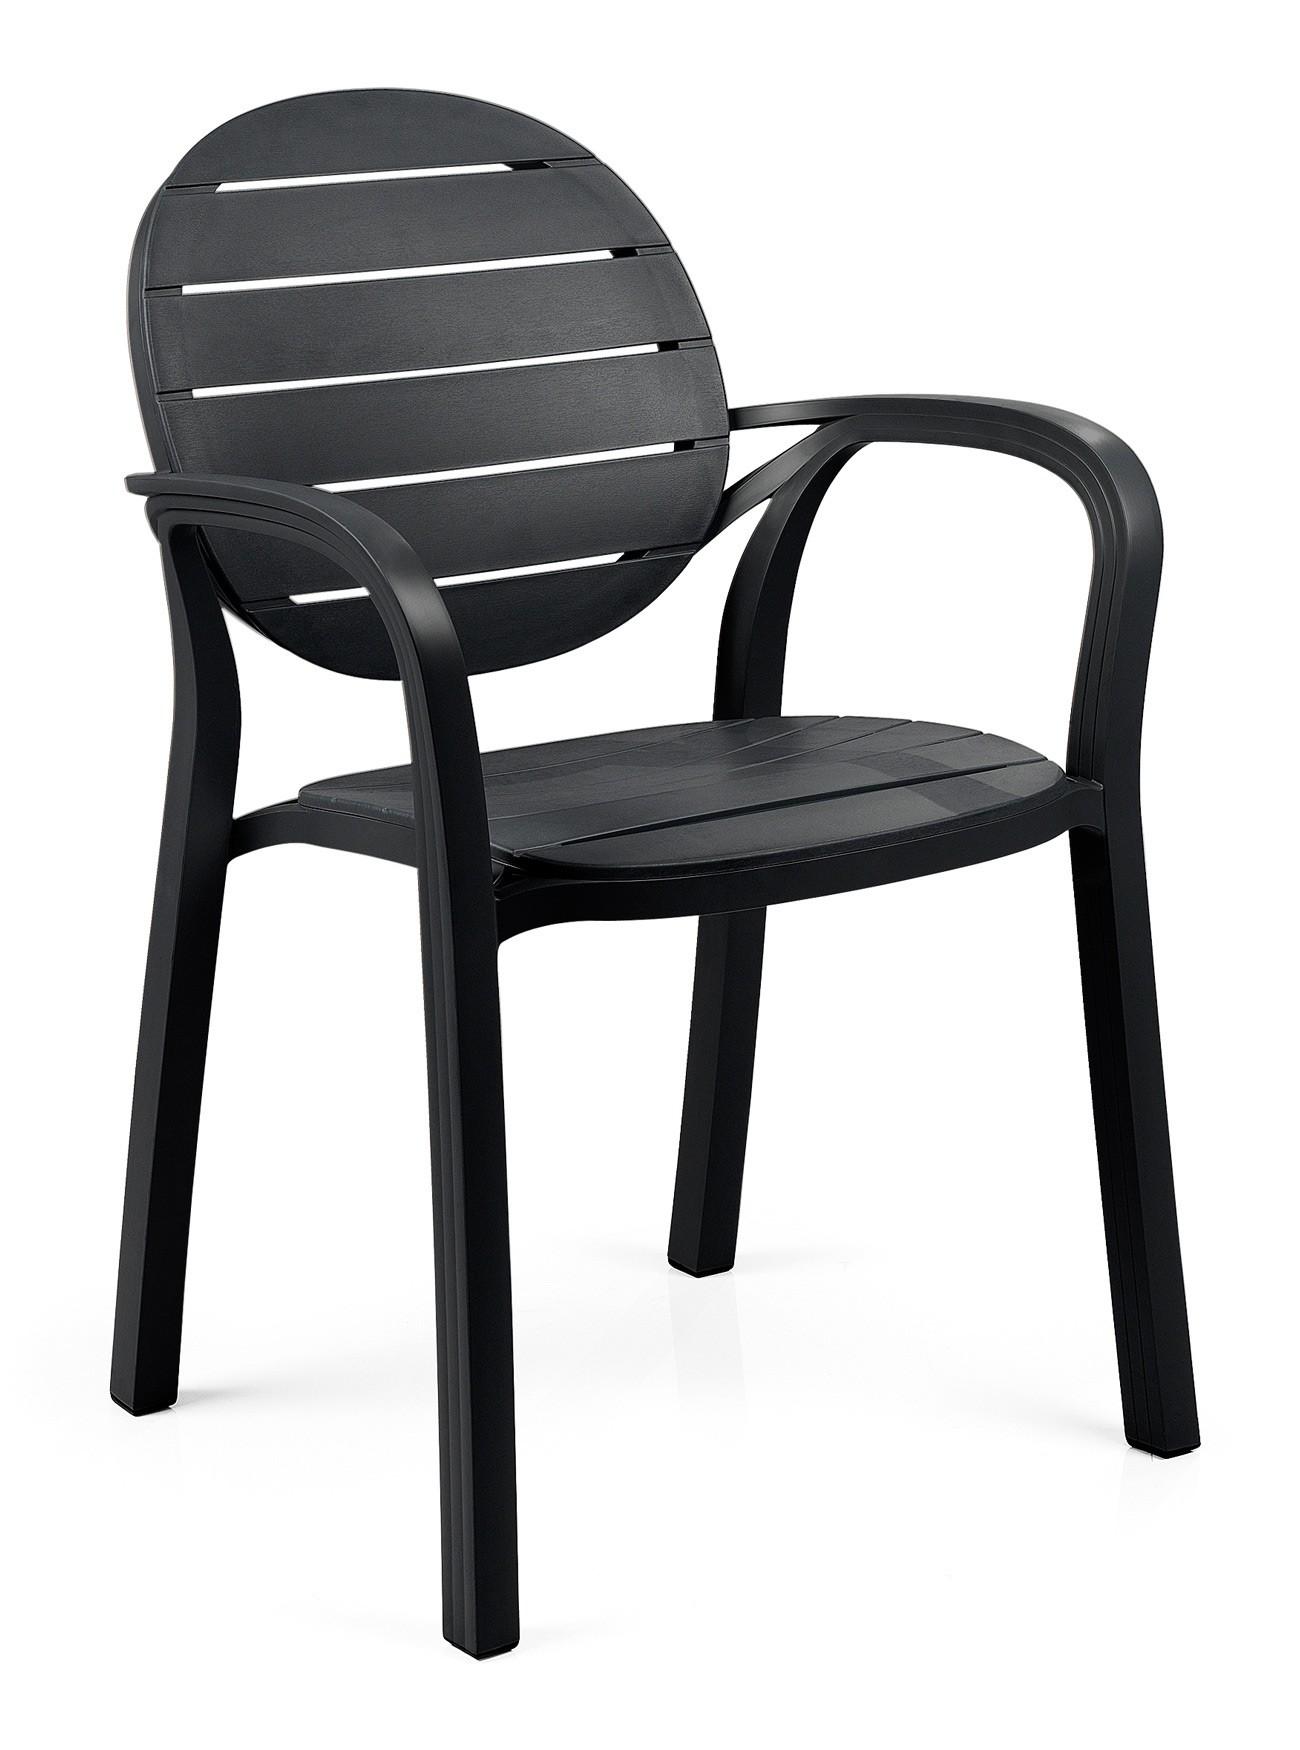 stapelstuhl gartenstuhl palma kunststoff stapelbar anthrazit bei. Black Bedroom Furniture Sets. Home Design Ideas